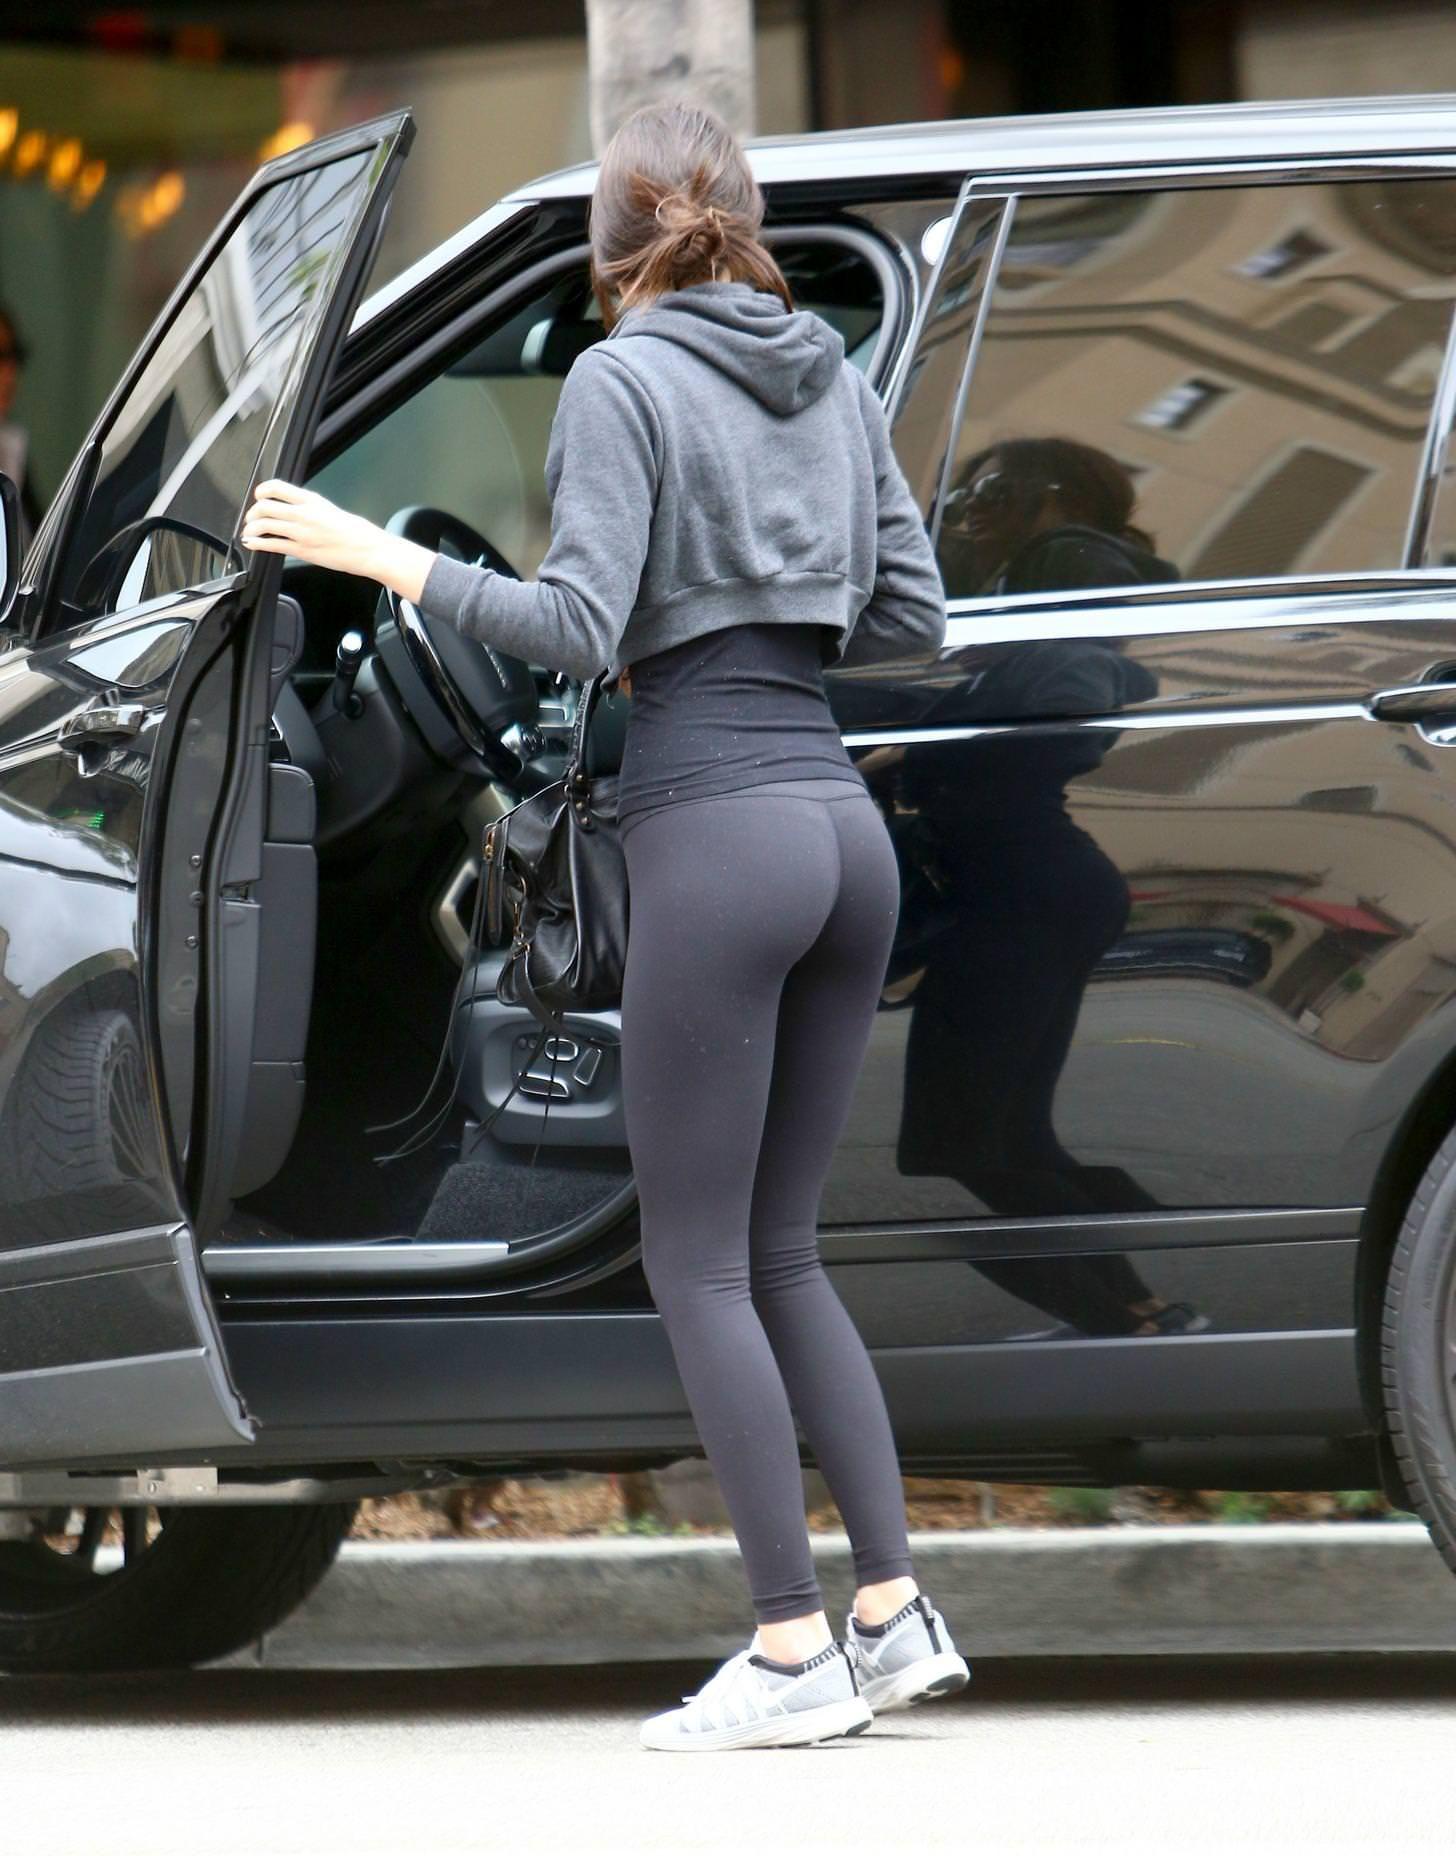 Yoga Pants Imgur This Girl S Outfit Looks Soo Comfy Via R Yogatique